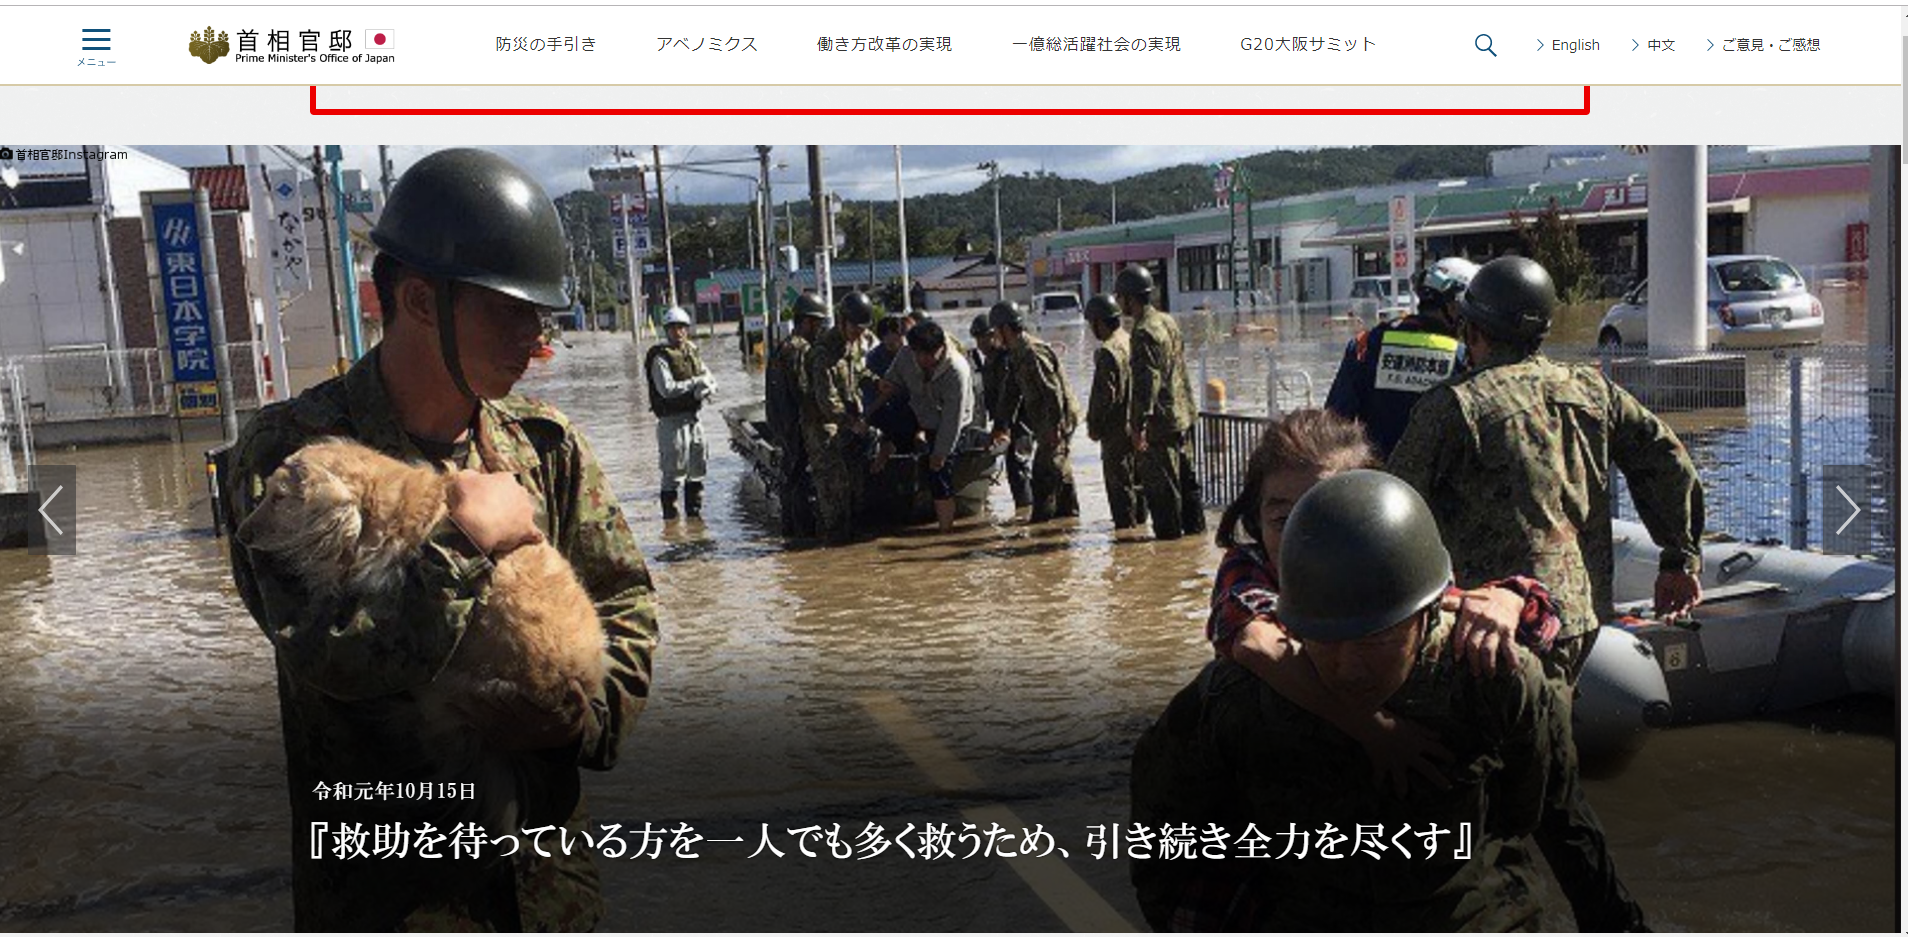 http://hunter-investigate.jp/news/ddc8d1d8bf9a3eb6607ca97e823e08871520b0af.png